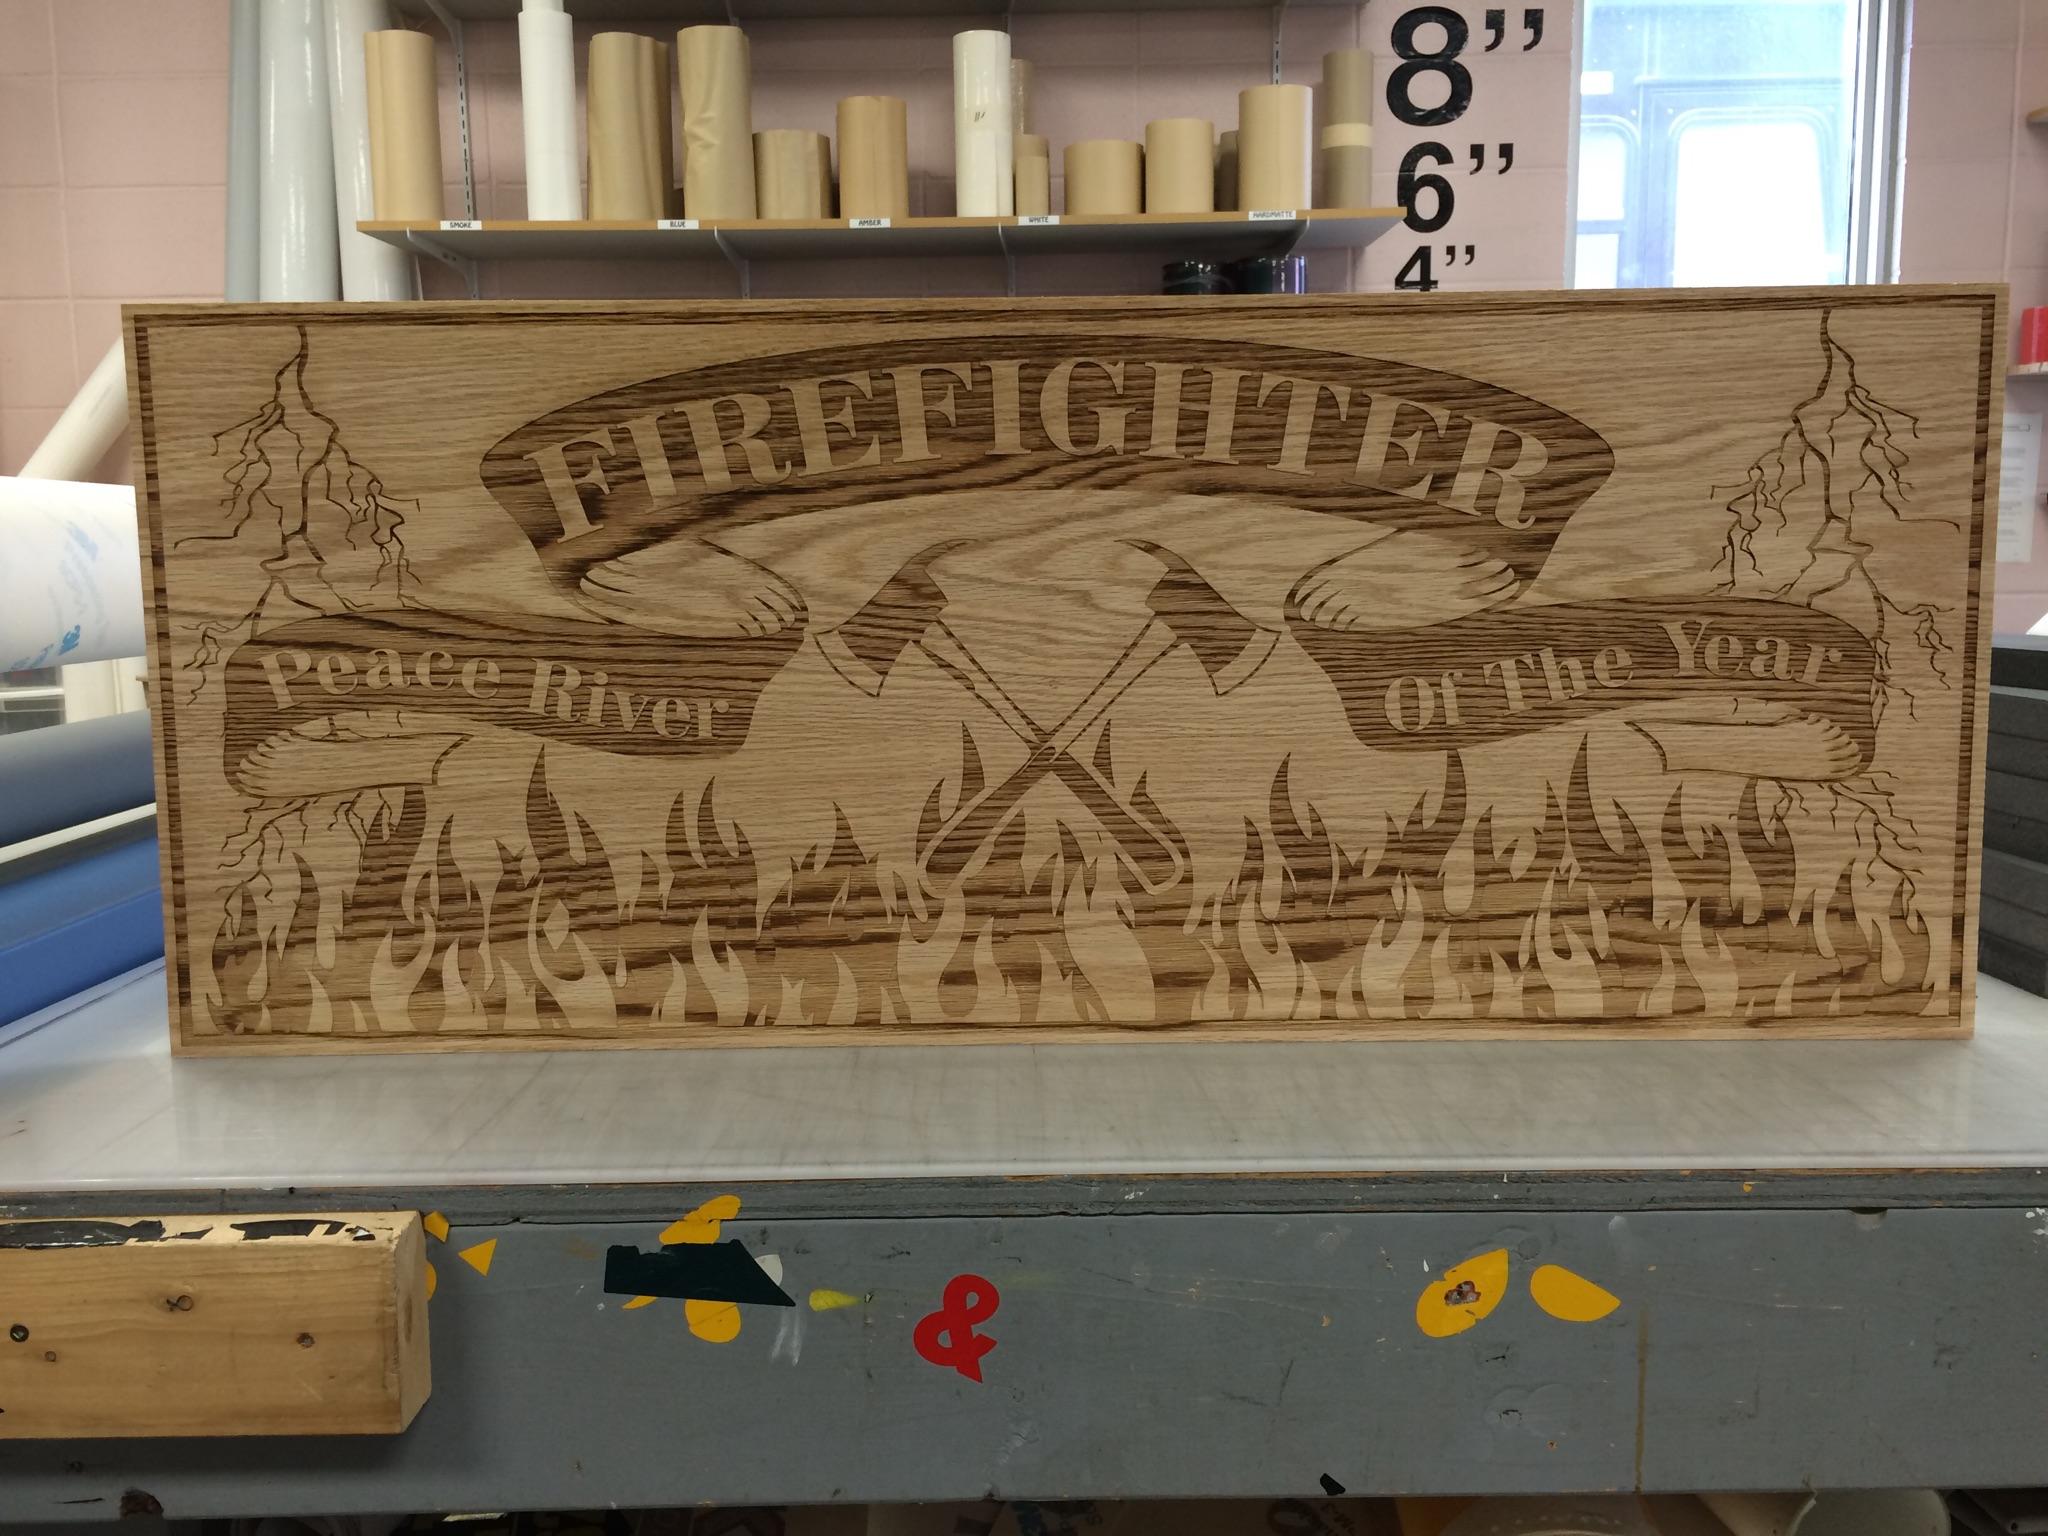 Firefighter Plaque